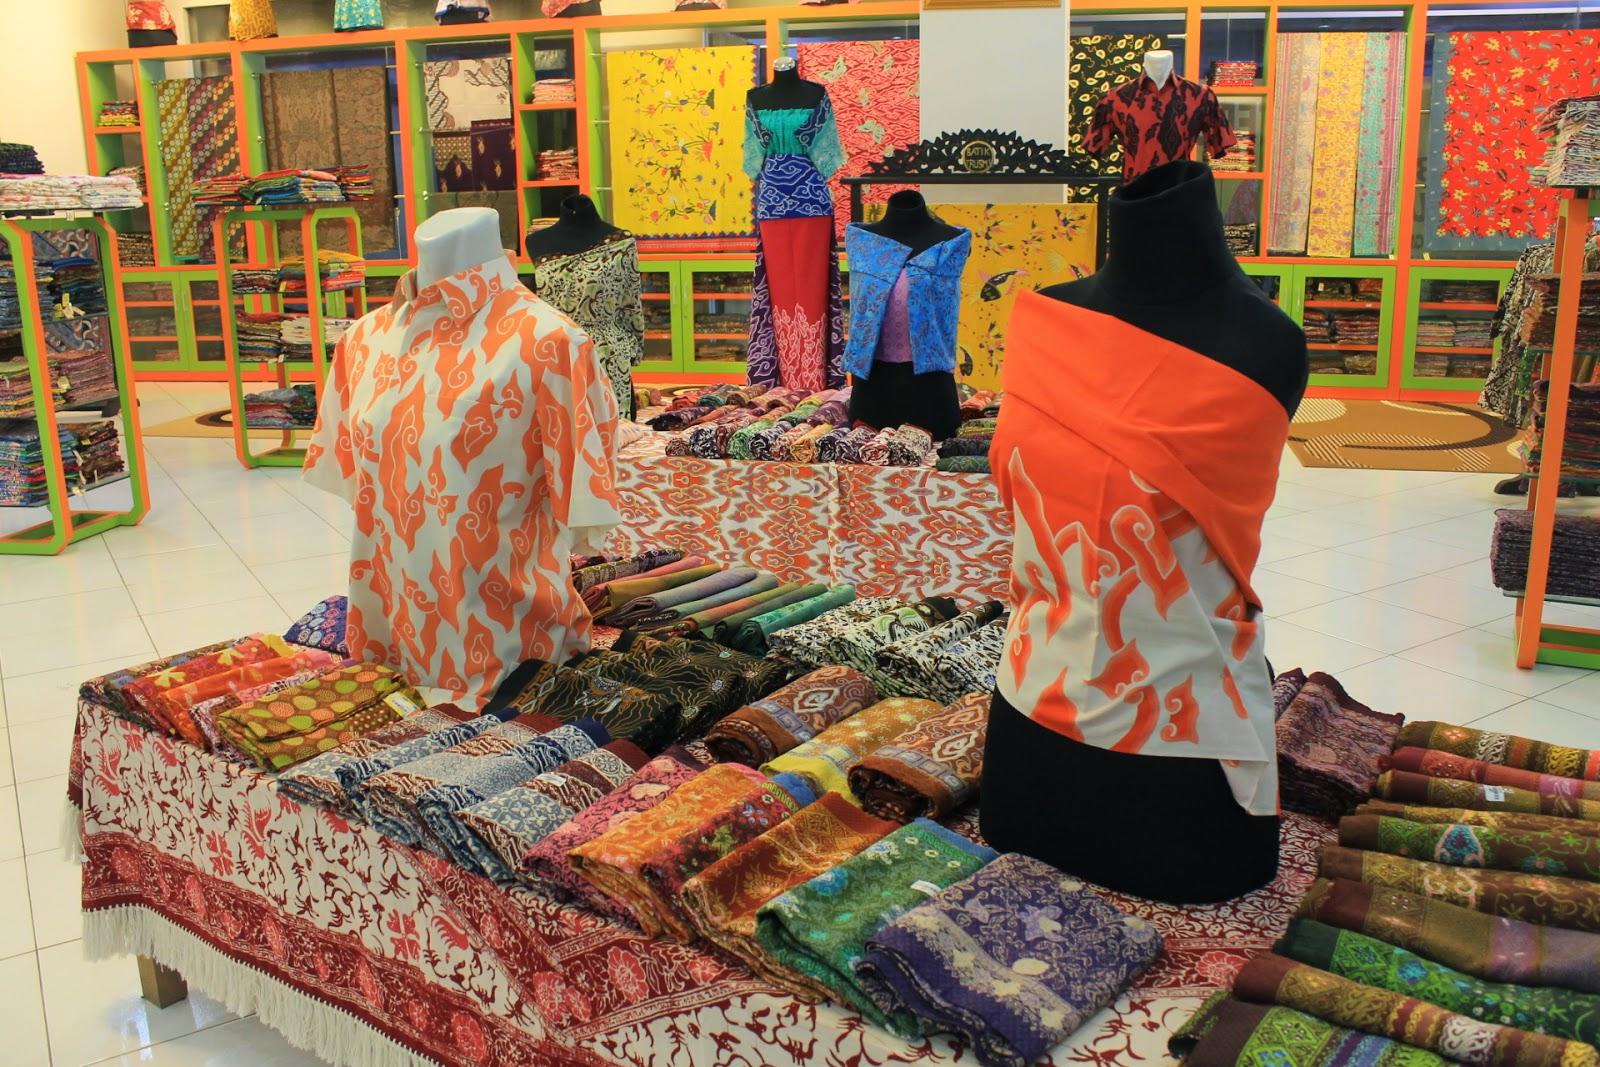 Pusat Grosir Baju Batik Trusmi Di Jatinegara